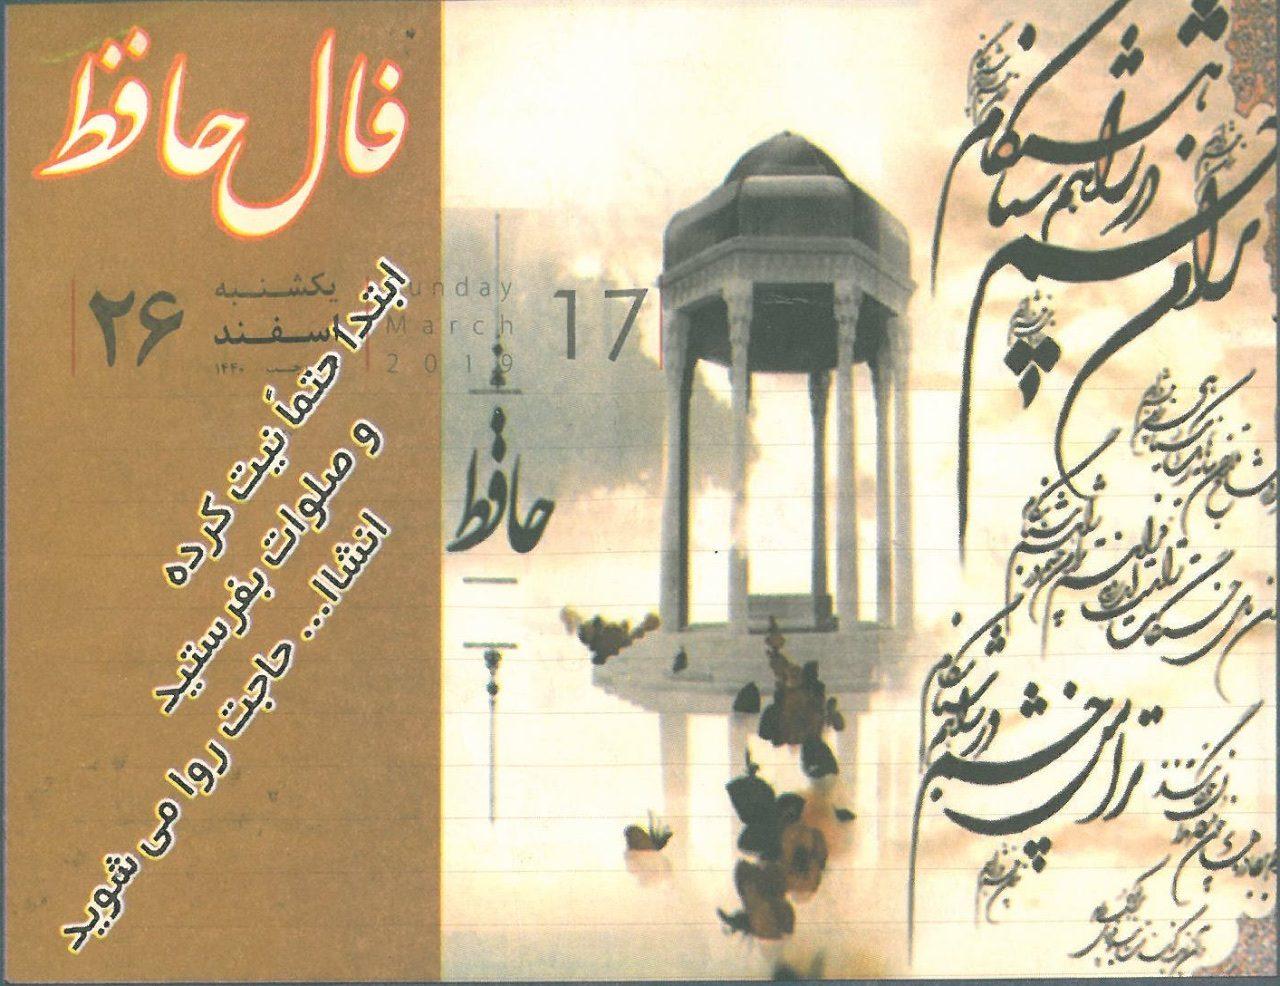 Augury by Hafez